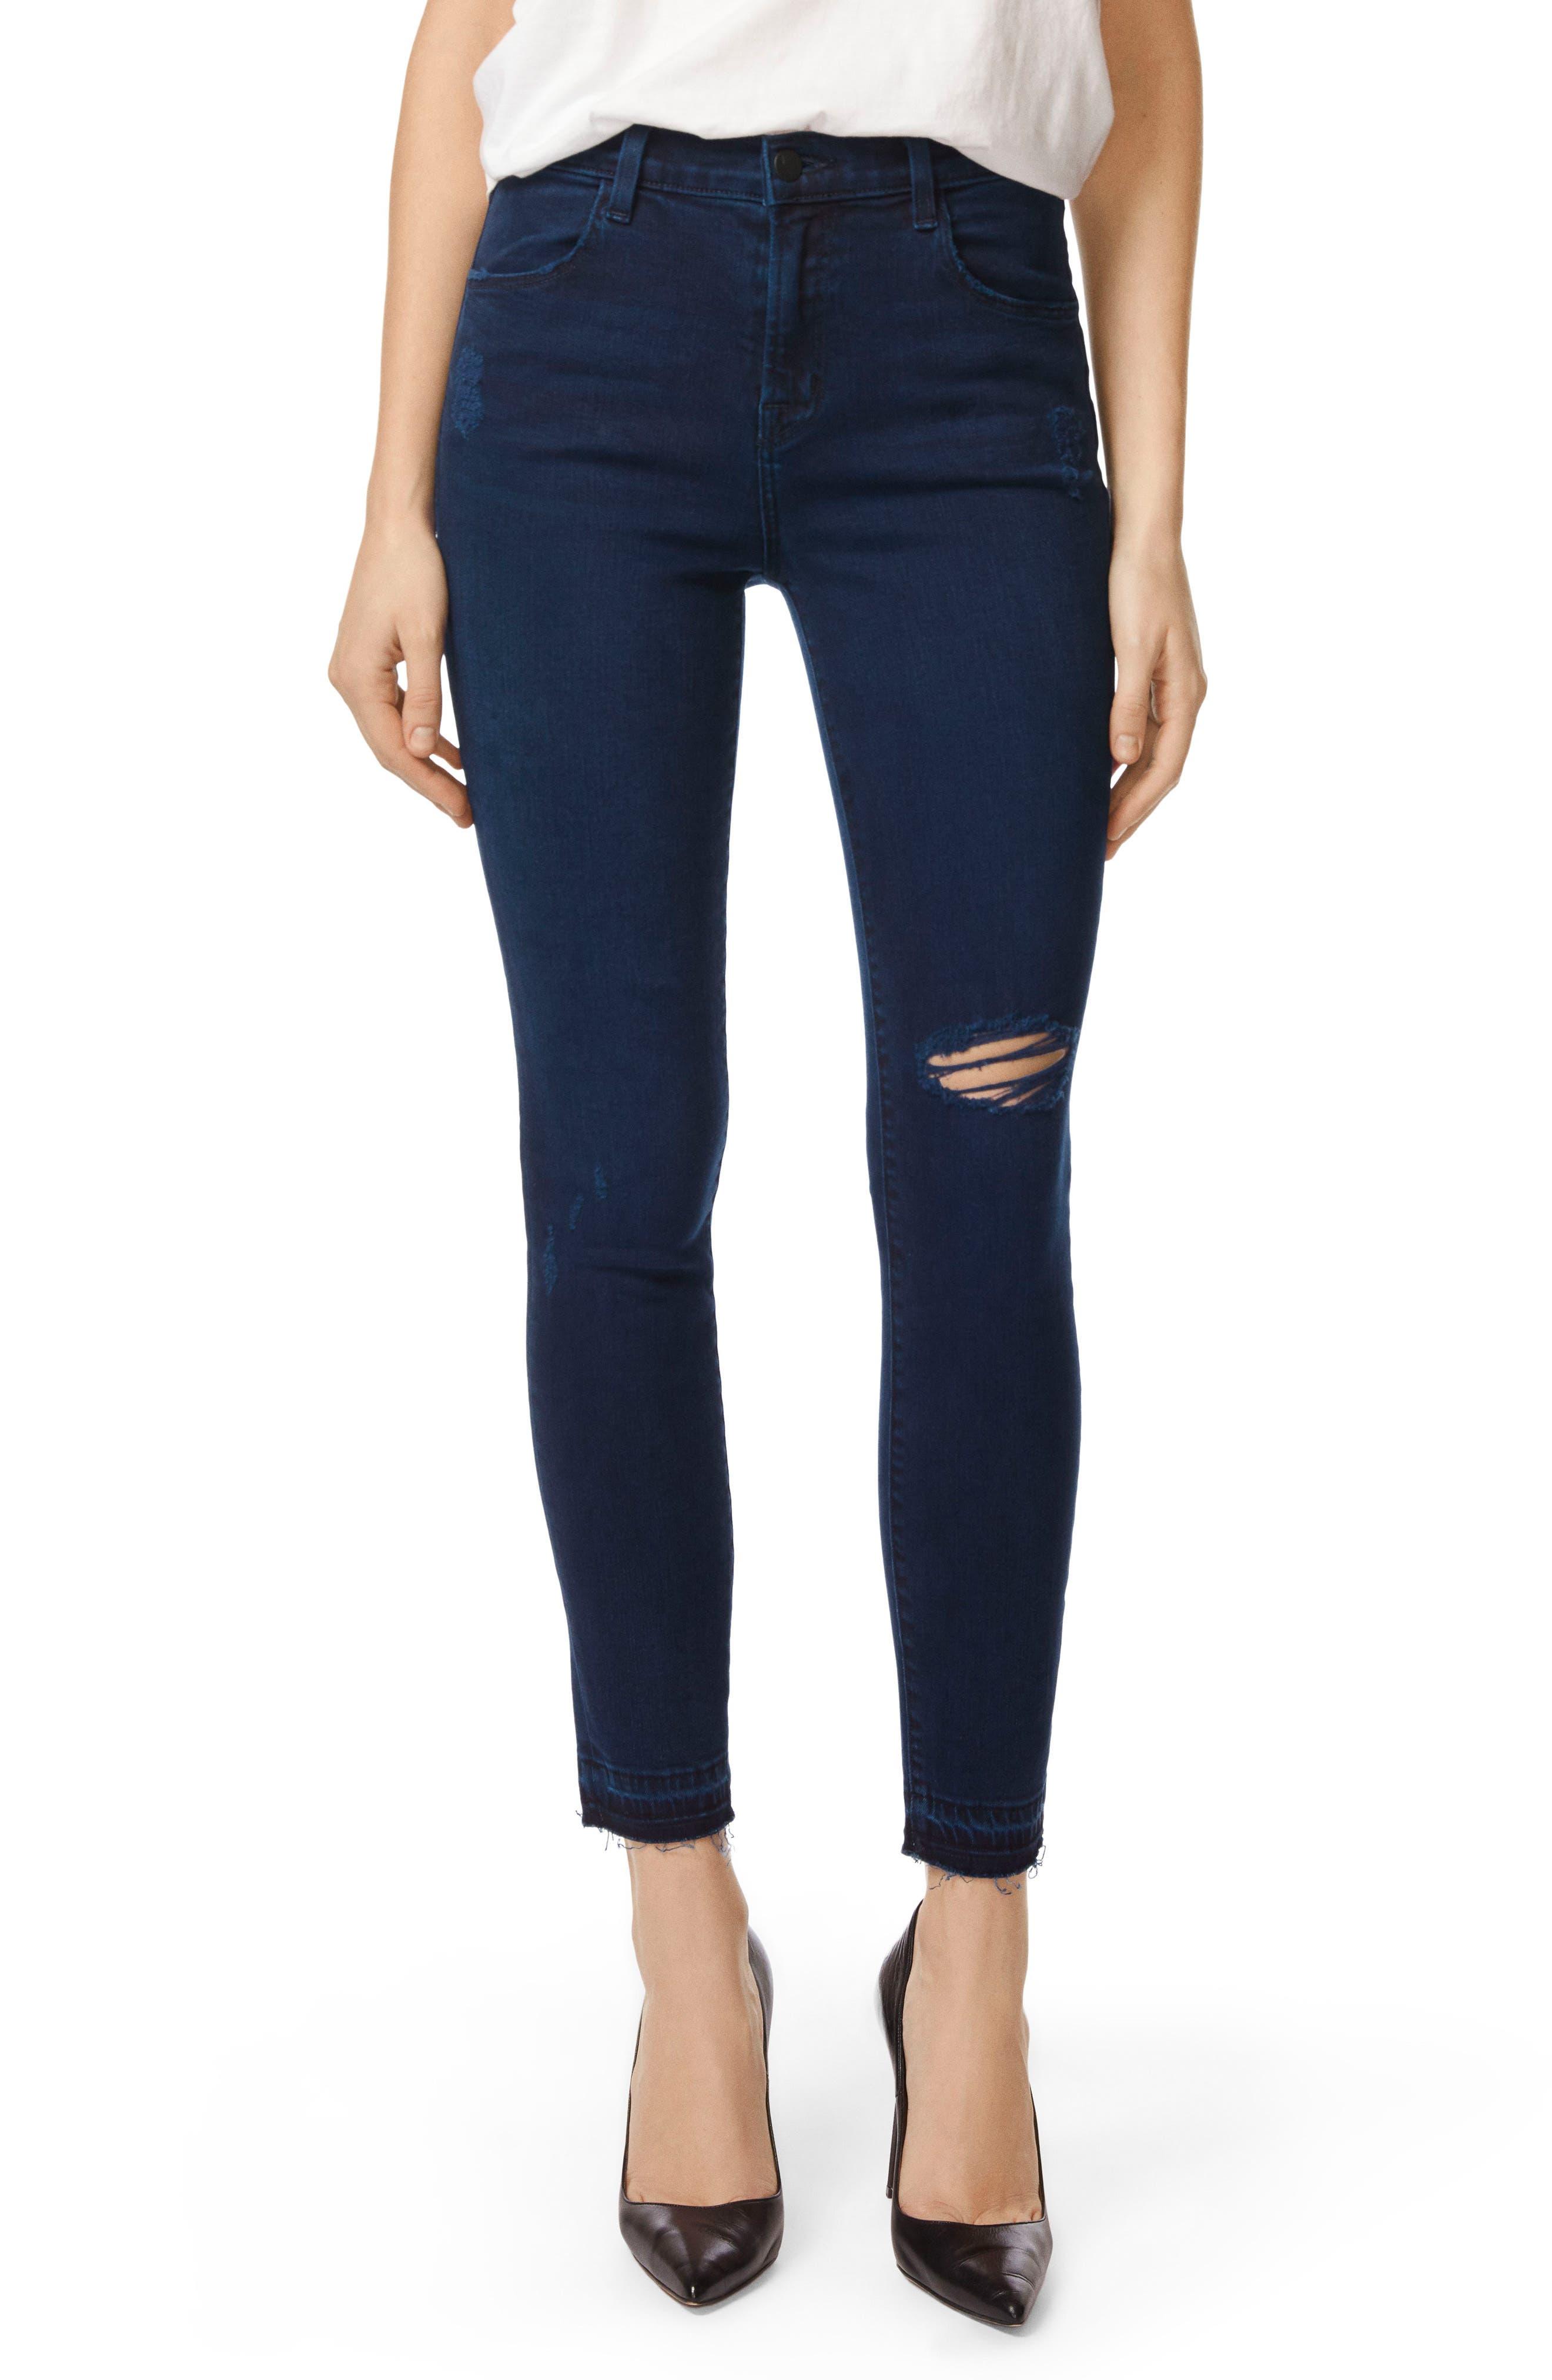 Alana Released Hem High Rise Crop Skinny Jeans,                             Main thumbnail 1, color,                             Invoke Destruct